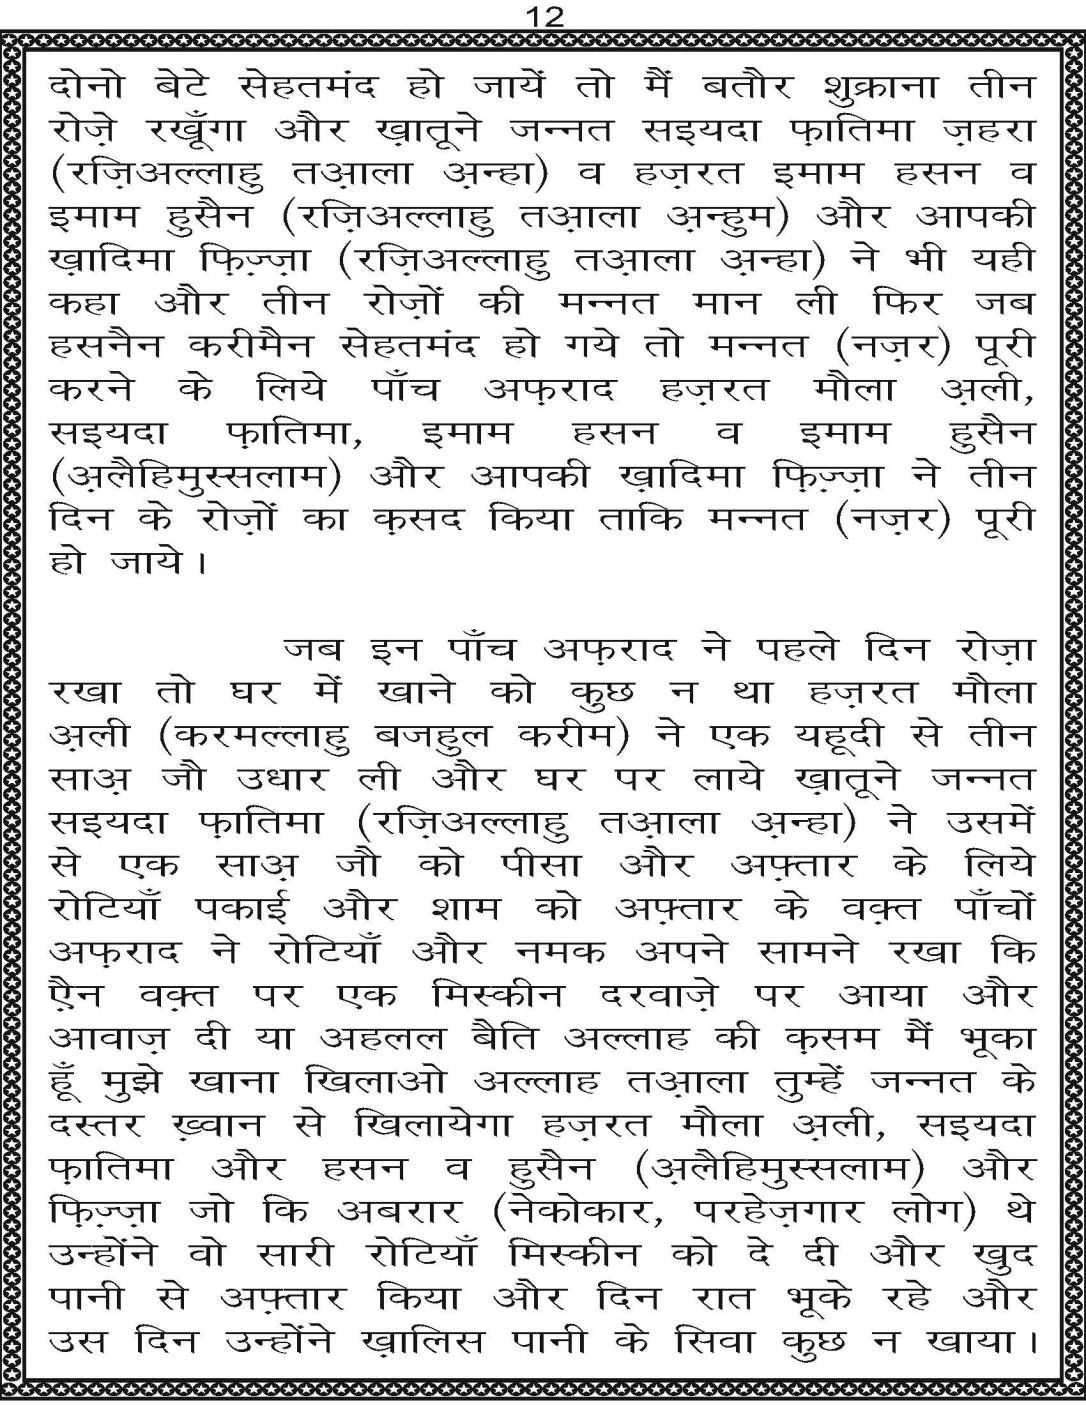 AzmateTaziyadari_Page_012